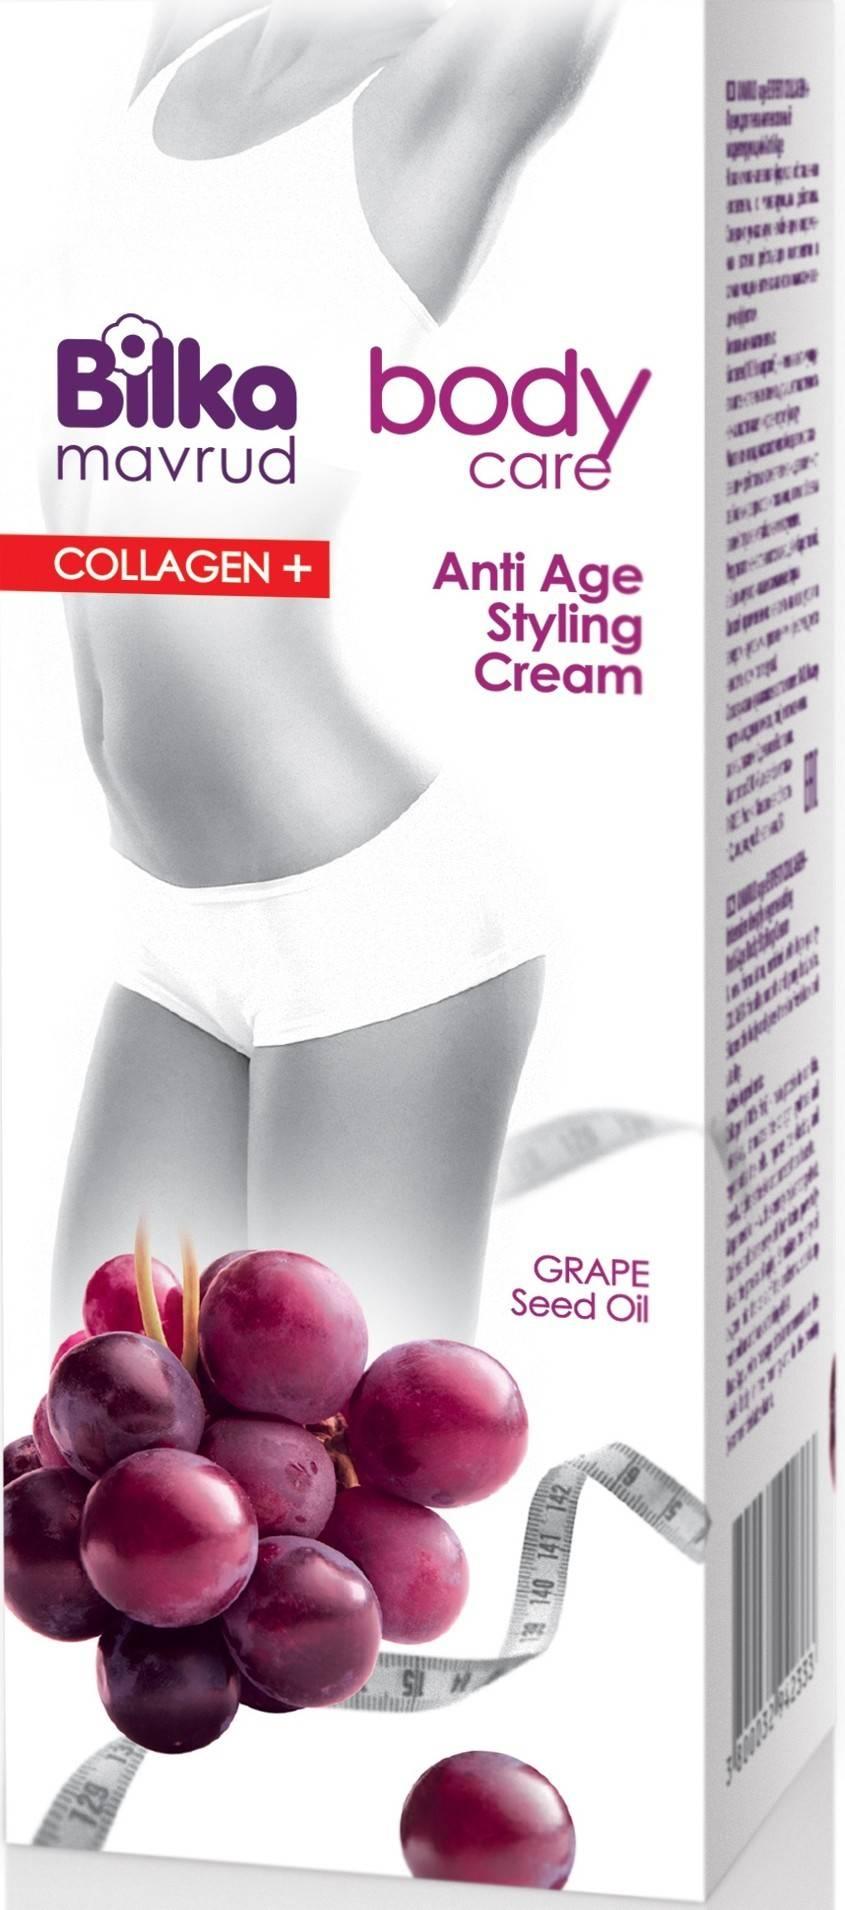 crema remodelare anti-age colagen+ bilka